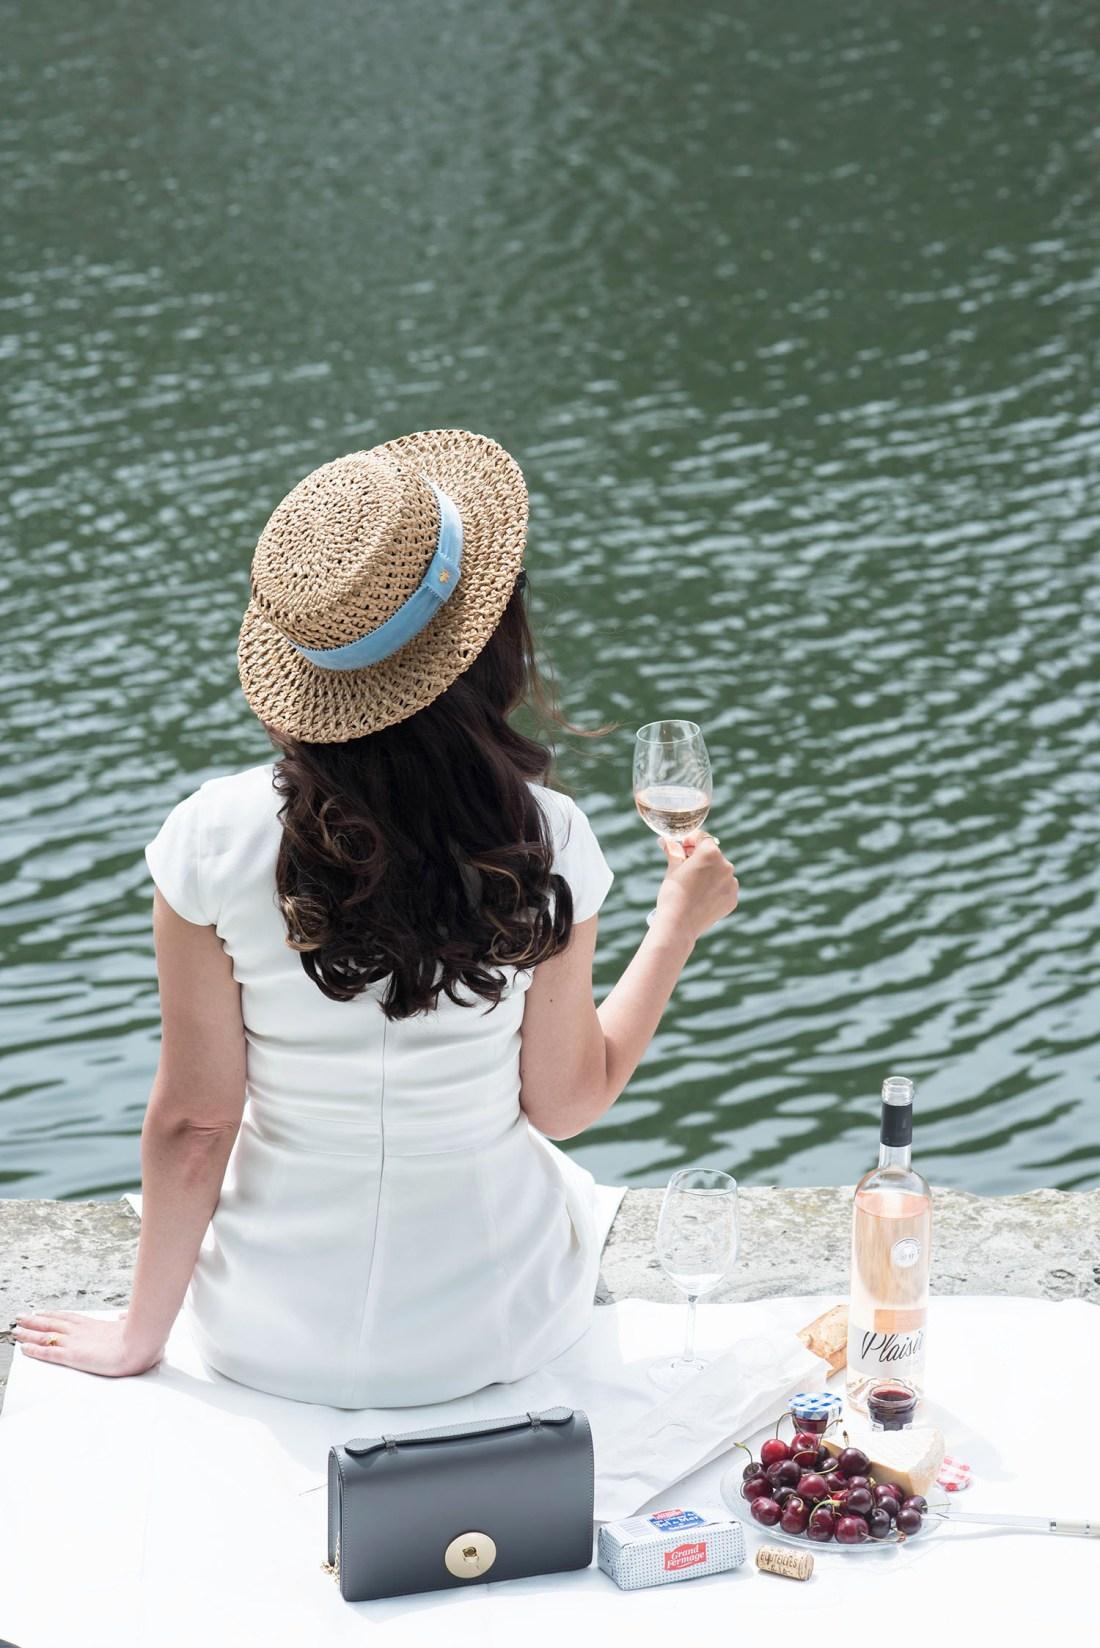 Fashion blogger Cee Fardoe of Coco & Vera celebrates Bastille Day in Paris drinking rose on the Seine wearing a Krasnova Modiste hat